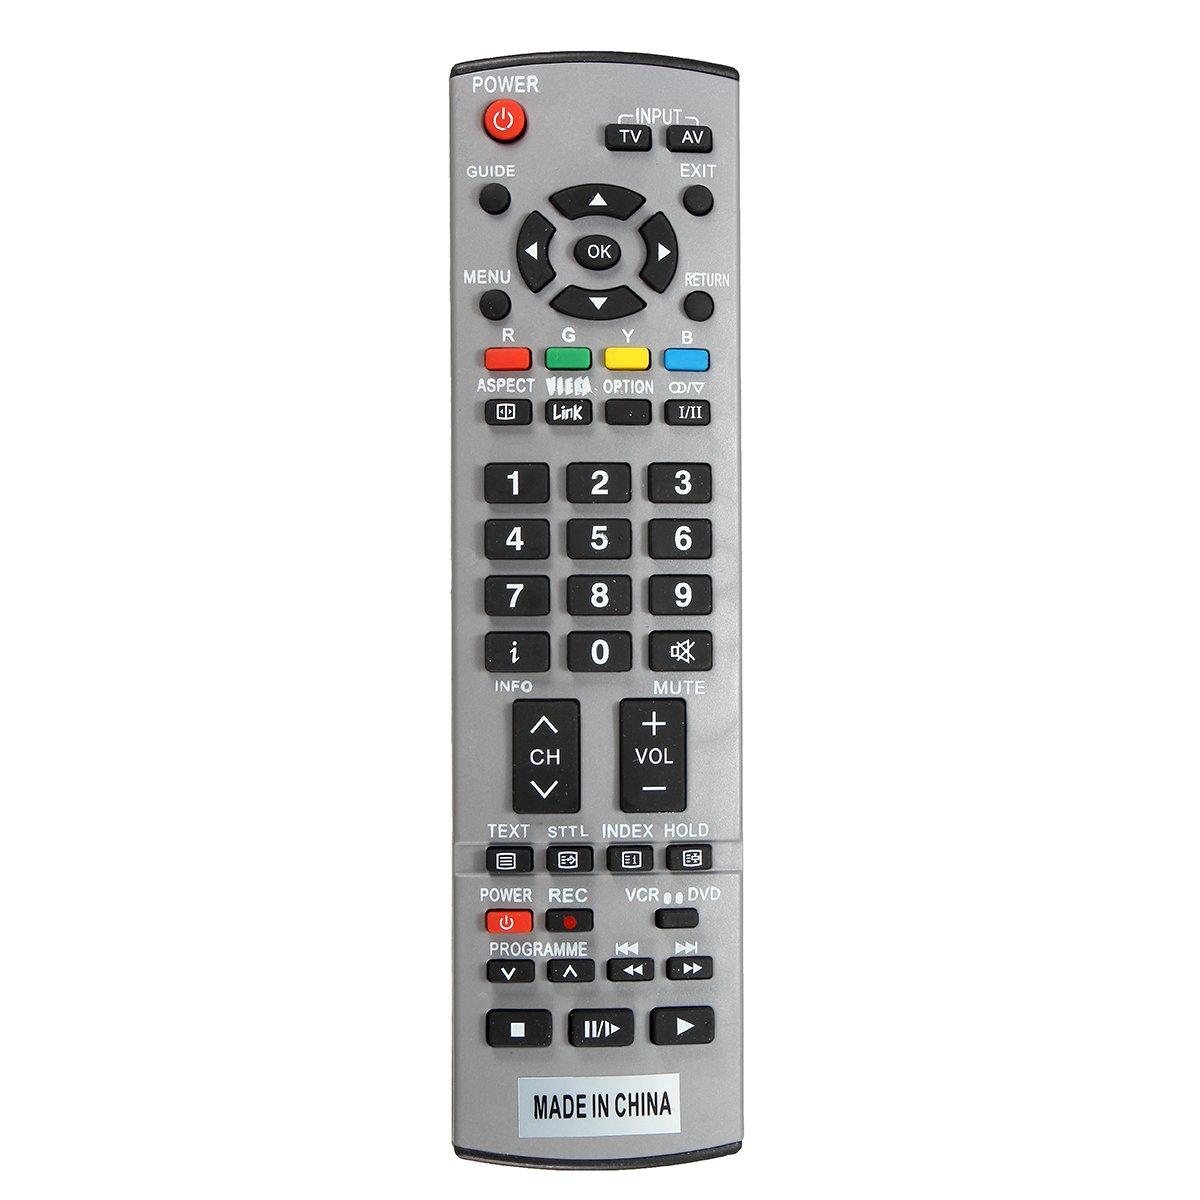 RM-Series – Mando a distancia para televisor Panasonic Viera EUR 7651120/71110/76280030: Amazon.es: Electrónica